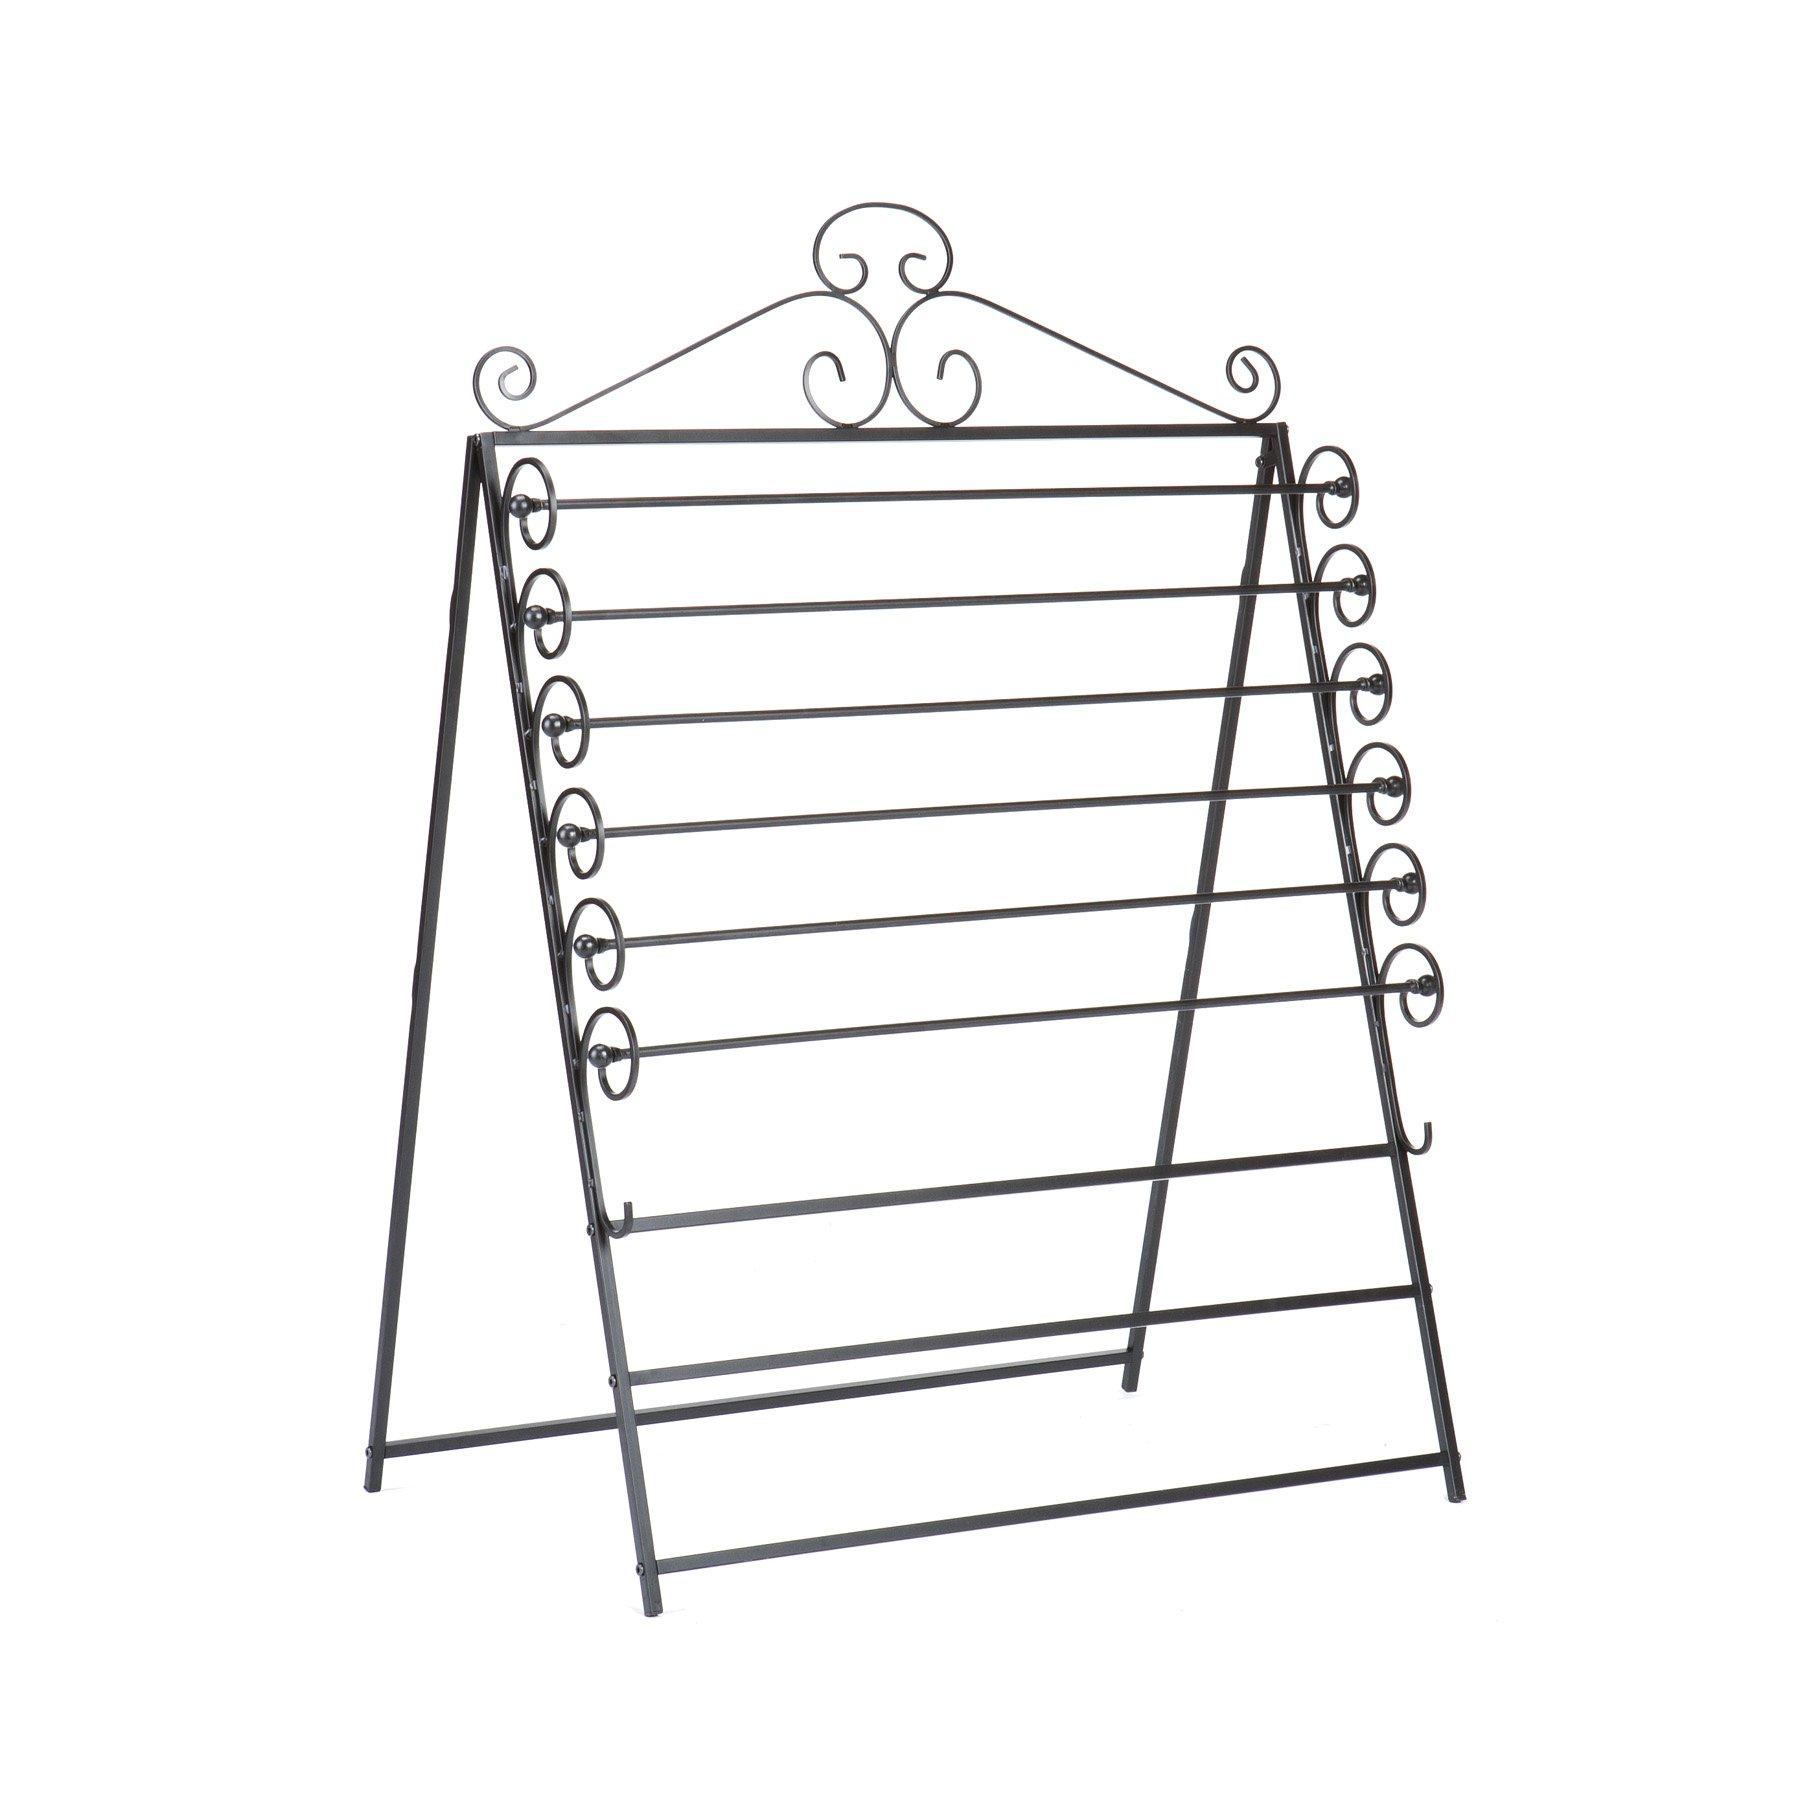 Southern Enterprises Easel/Wall Mount Craft Storage Rack - Black Metal Frame - 6 Movable Racks by Southern Enterprises